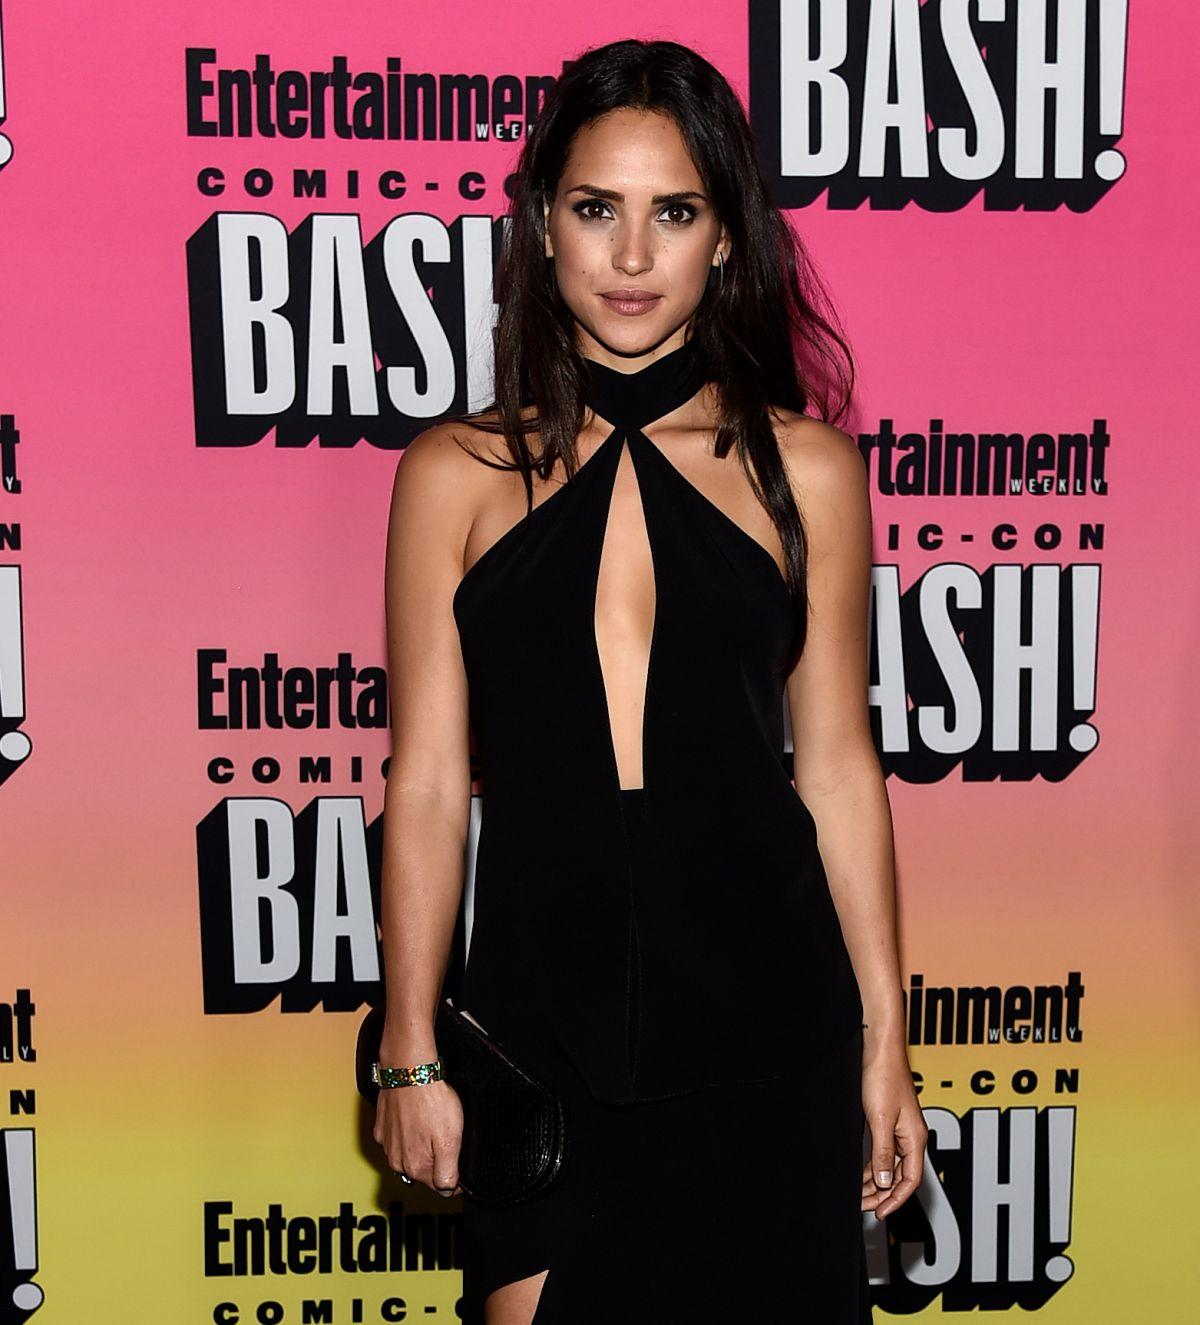 ADRIA ARJONA at Entertainment Weekly